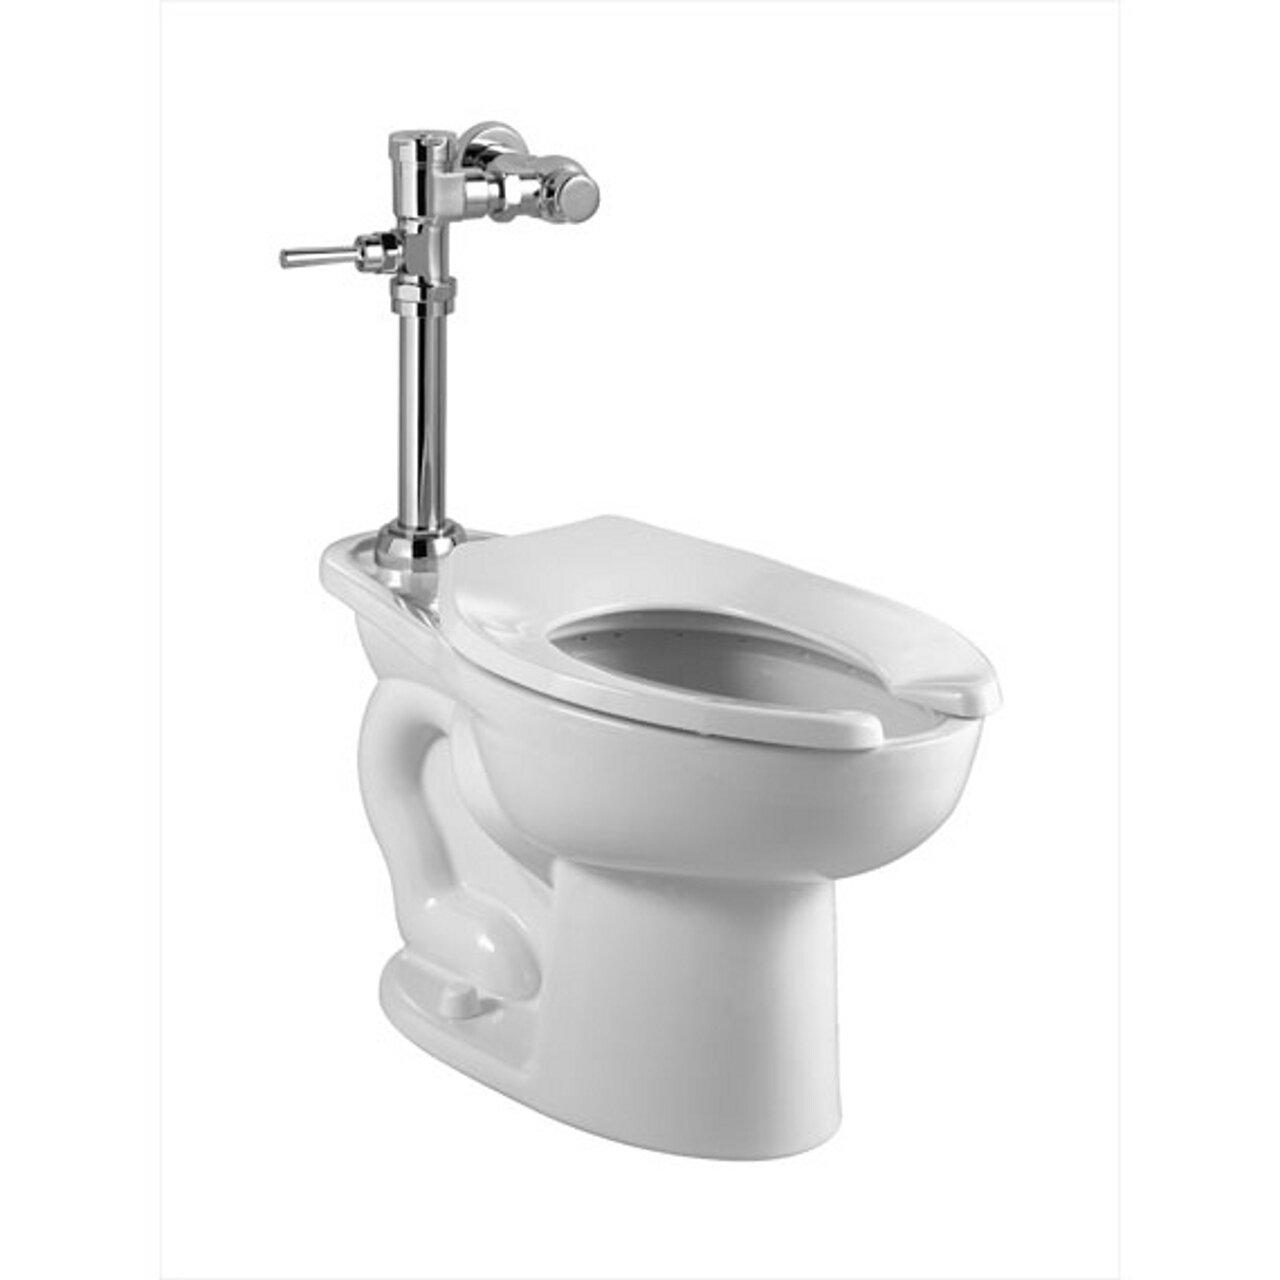 American Standard 2857.128.020 Madera ADA 1.28 GPF Toilet with Manual Flush Valve, White